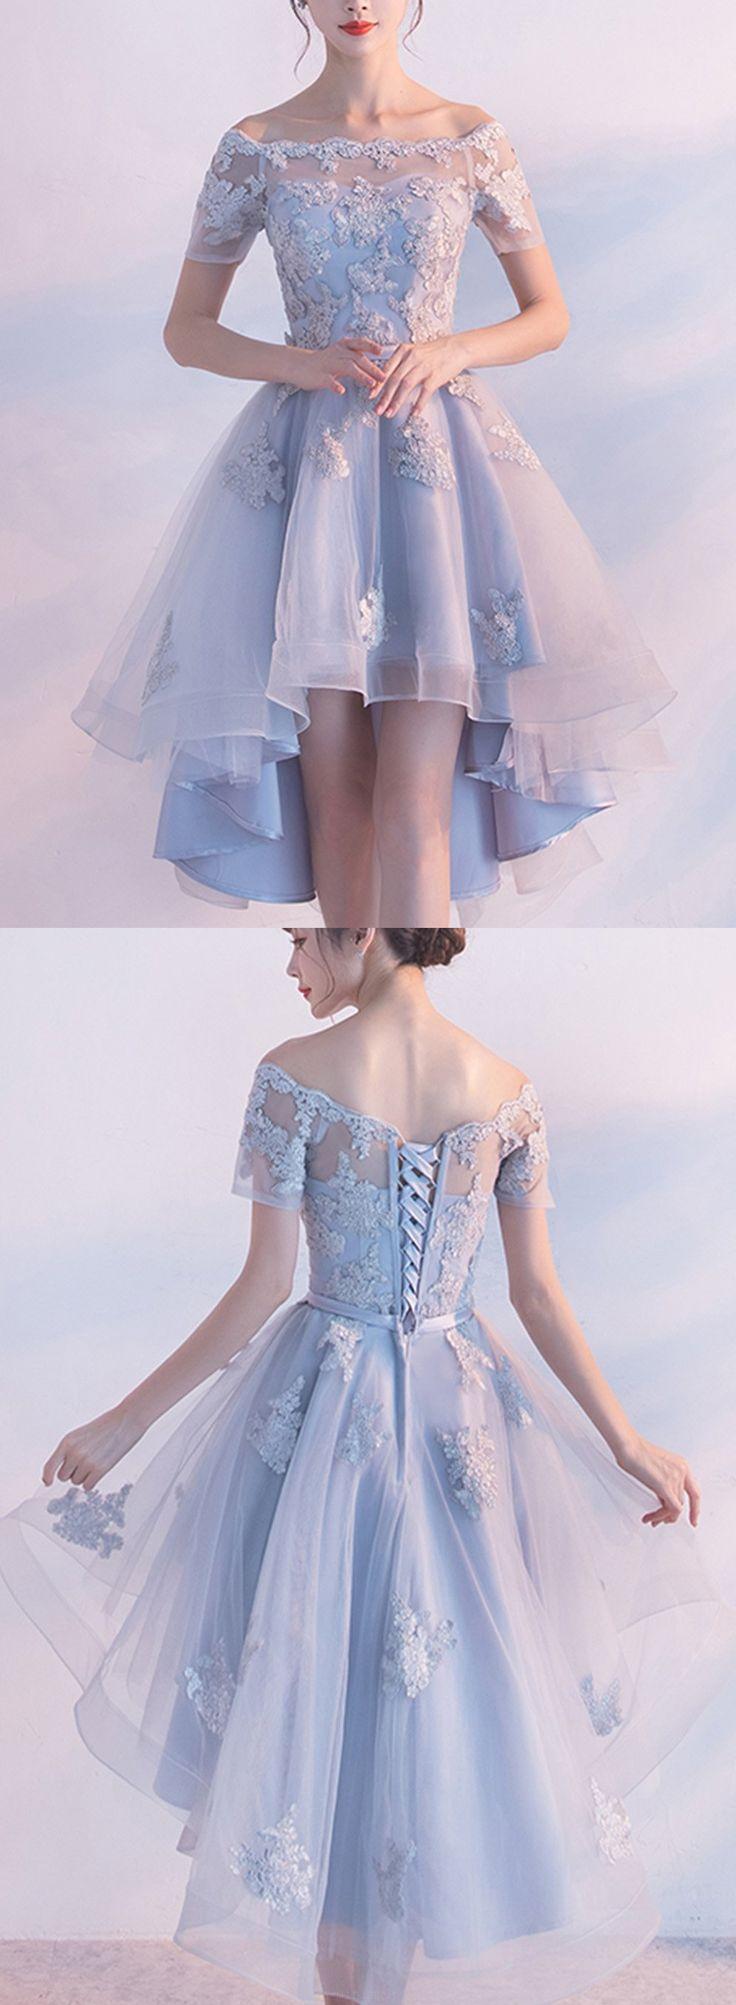 best dresses images on Pinterest Cute dresses Clothing apparel